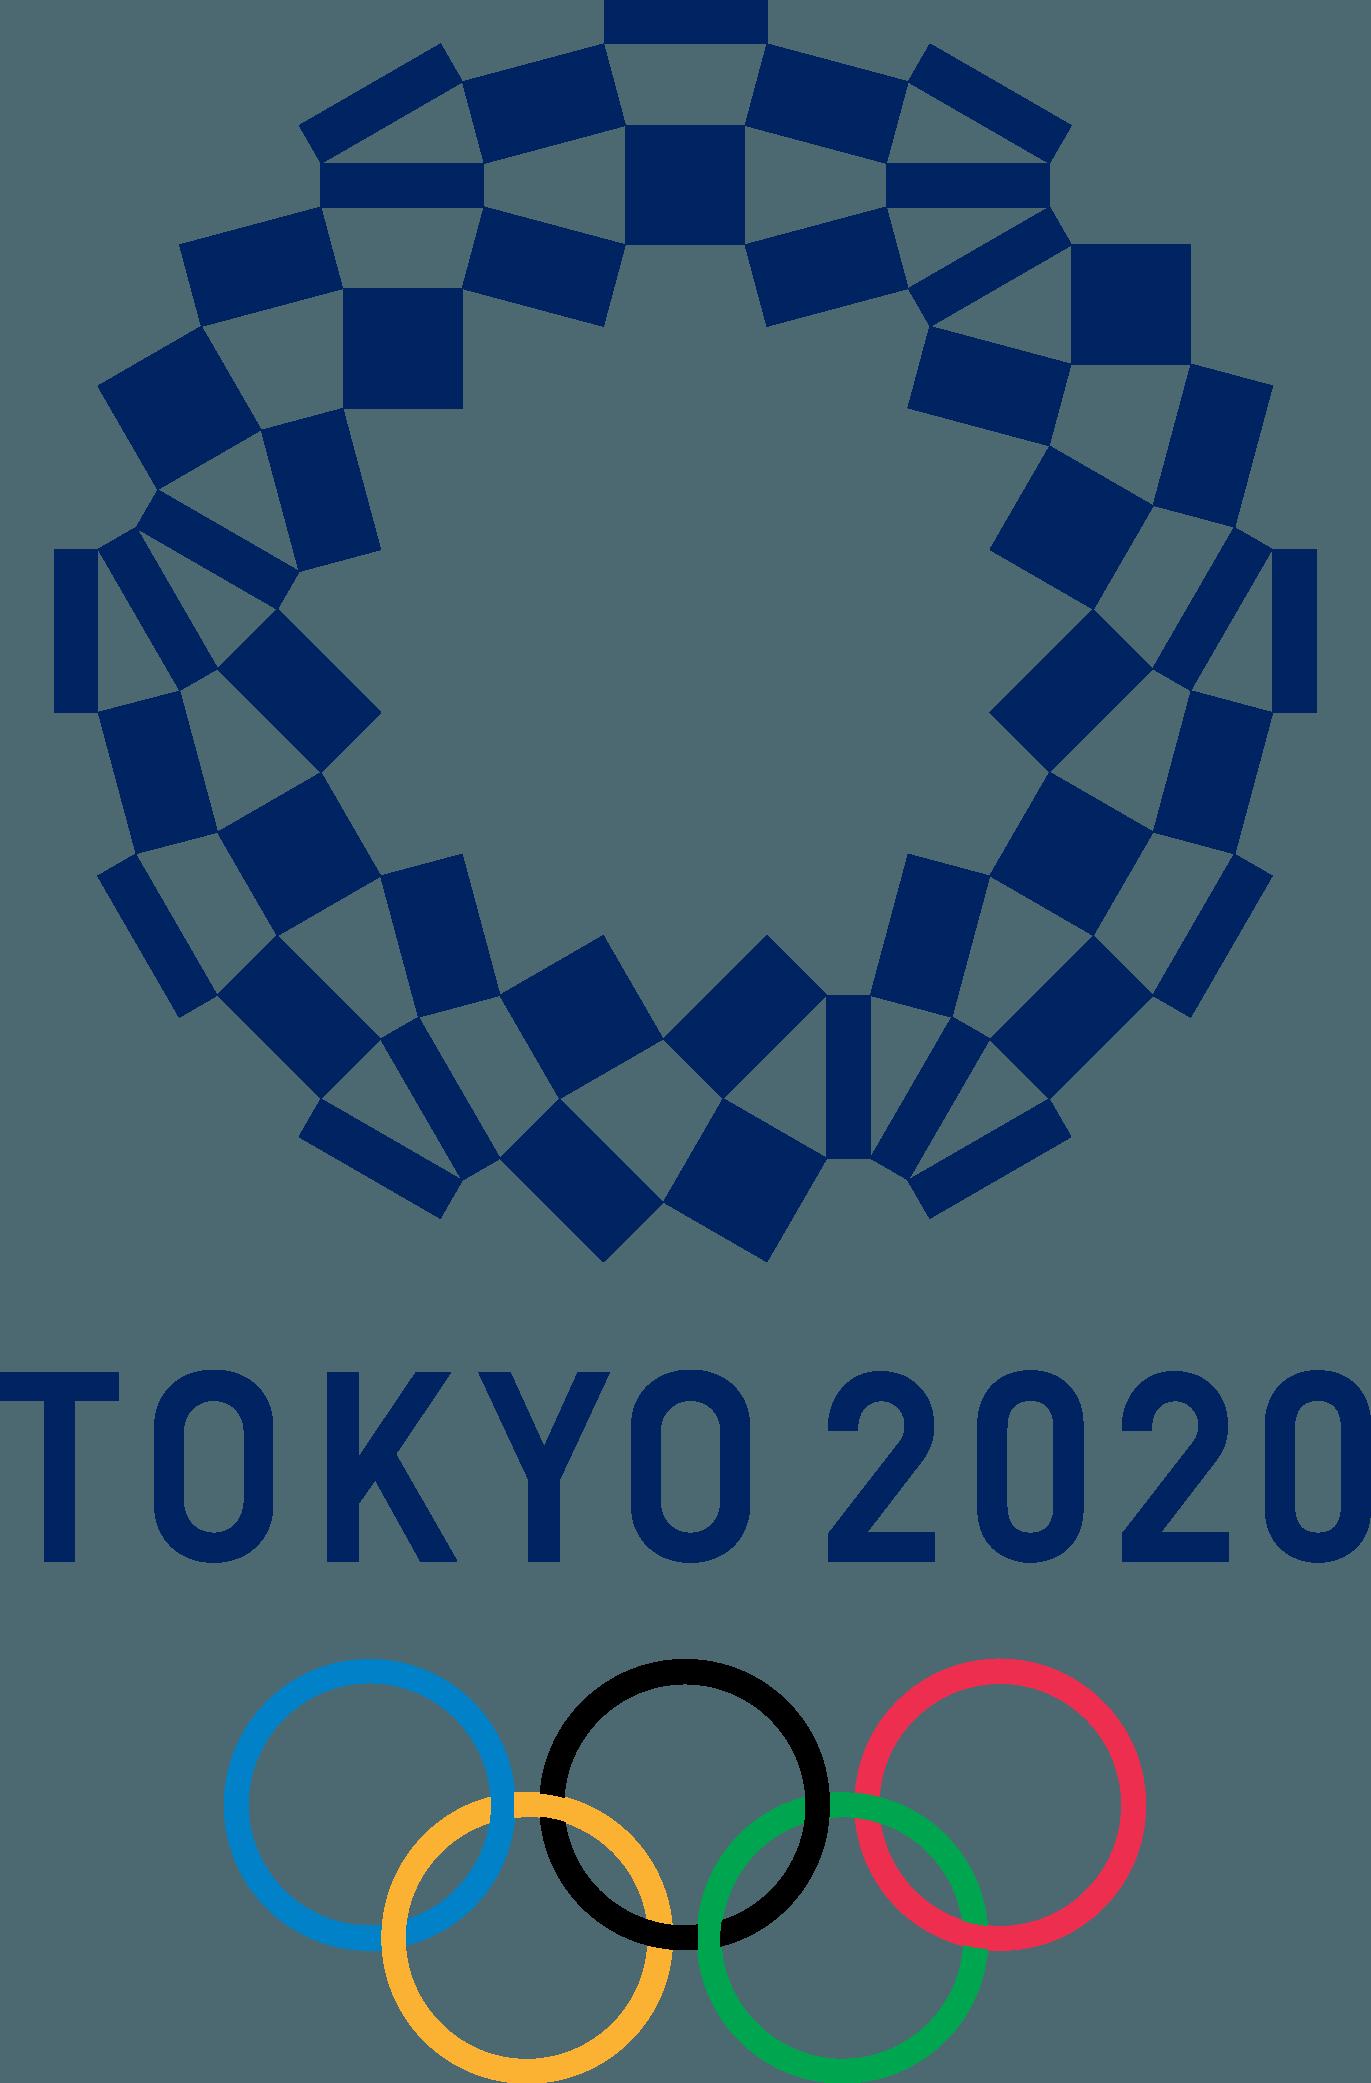 Tokyo 2020 Logo (Summer Olympics) png